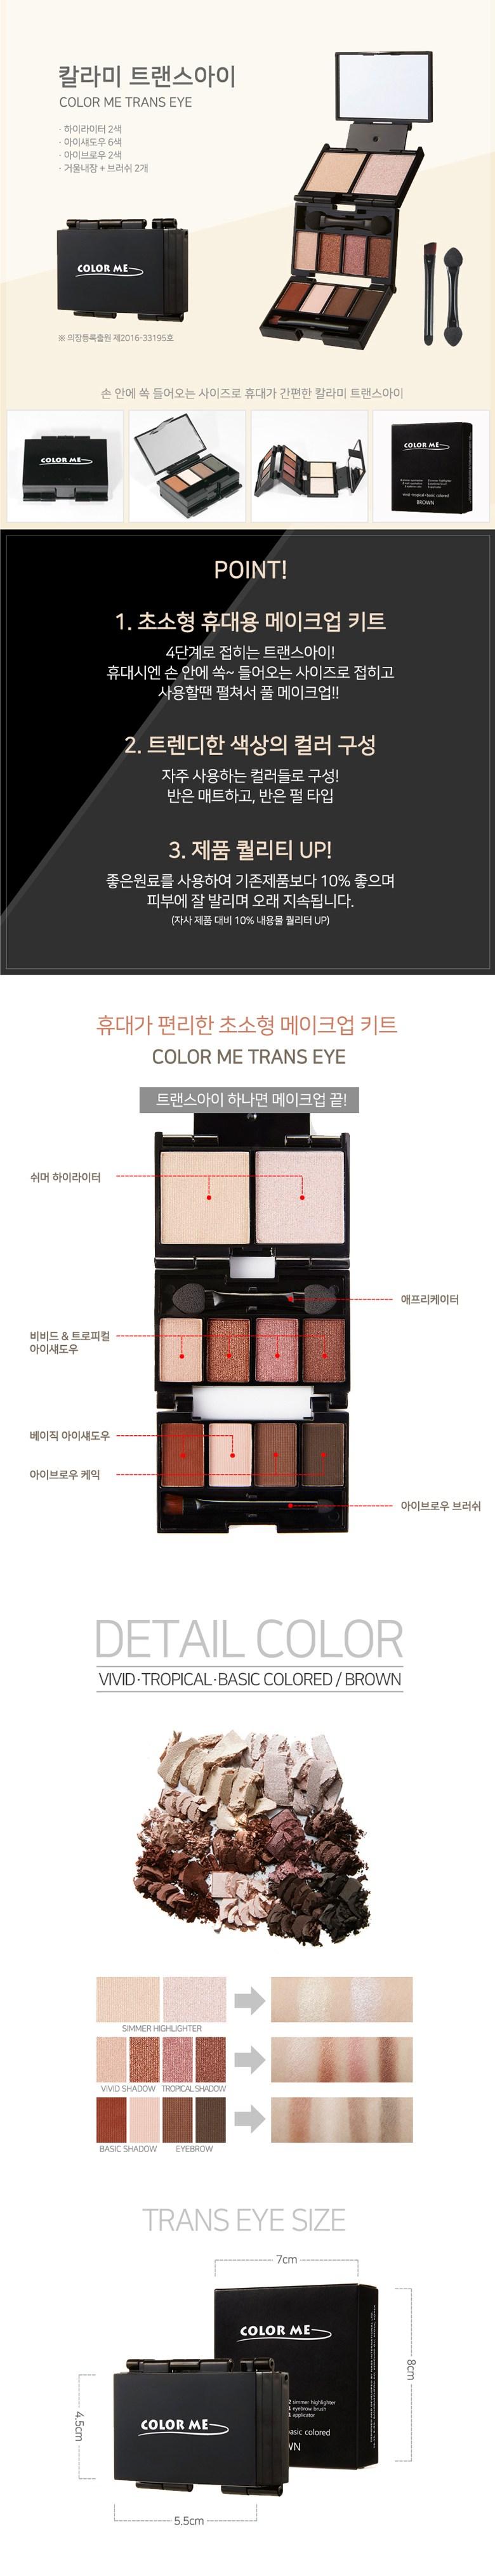 color-me-eyeshadow-10color.jpg